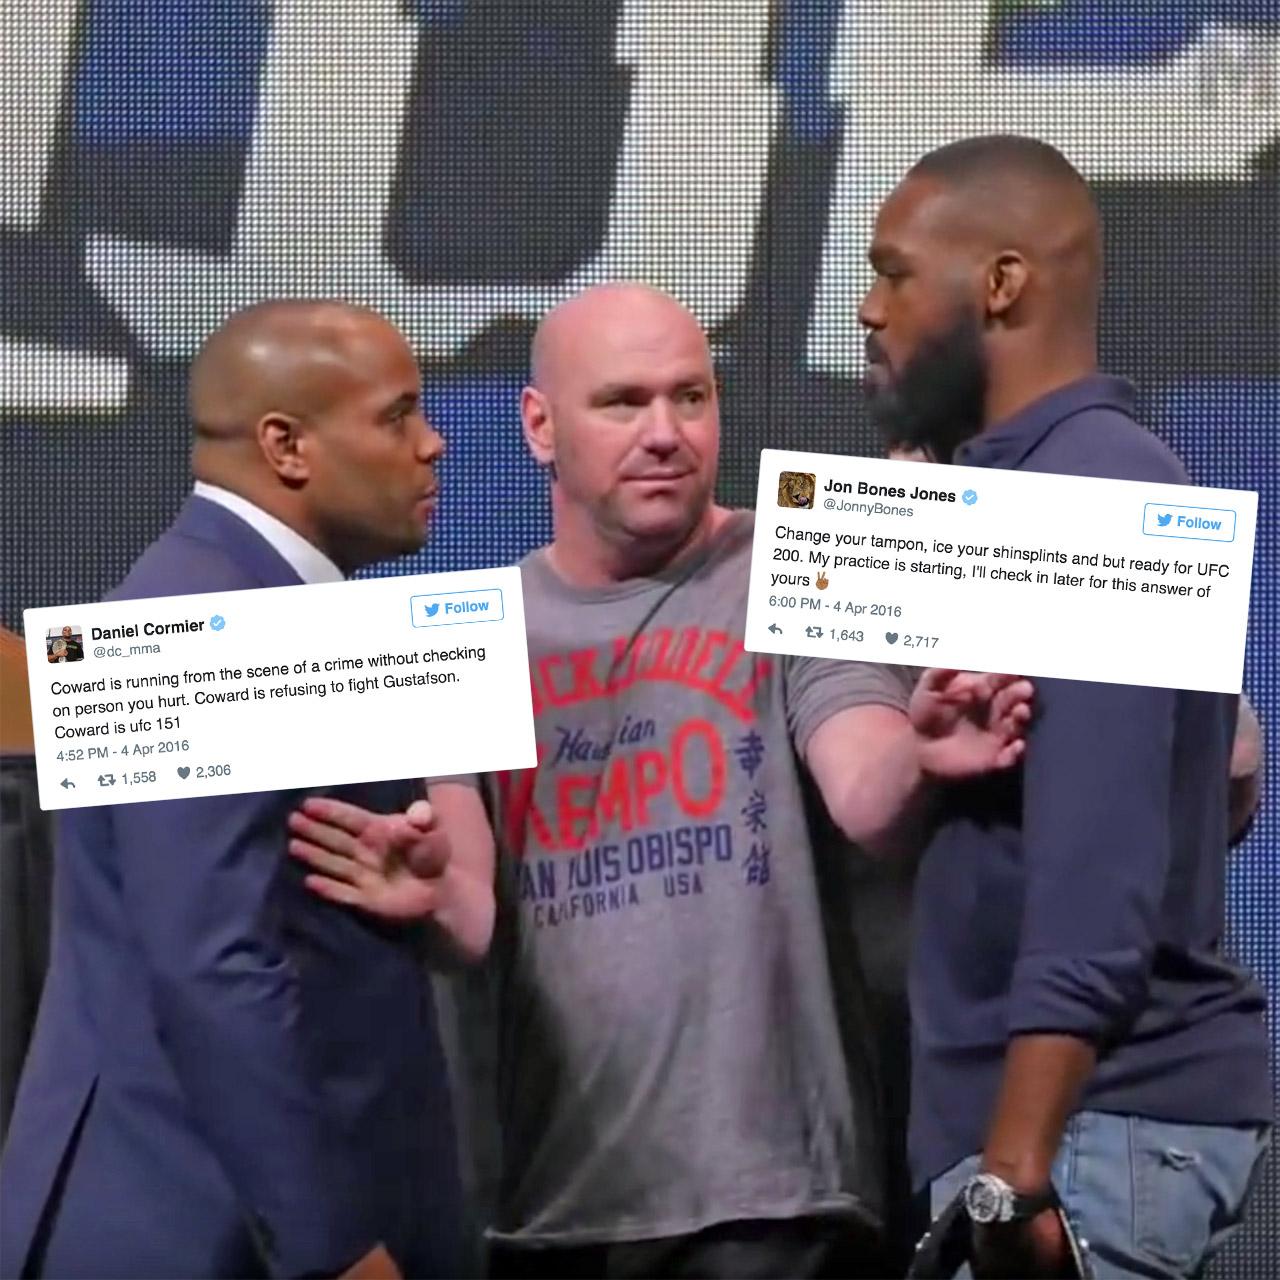 Daniel Cormier and Jon Jones fight on Twitter after UFC 197 date nixed